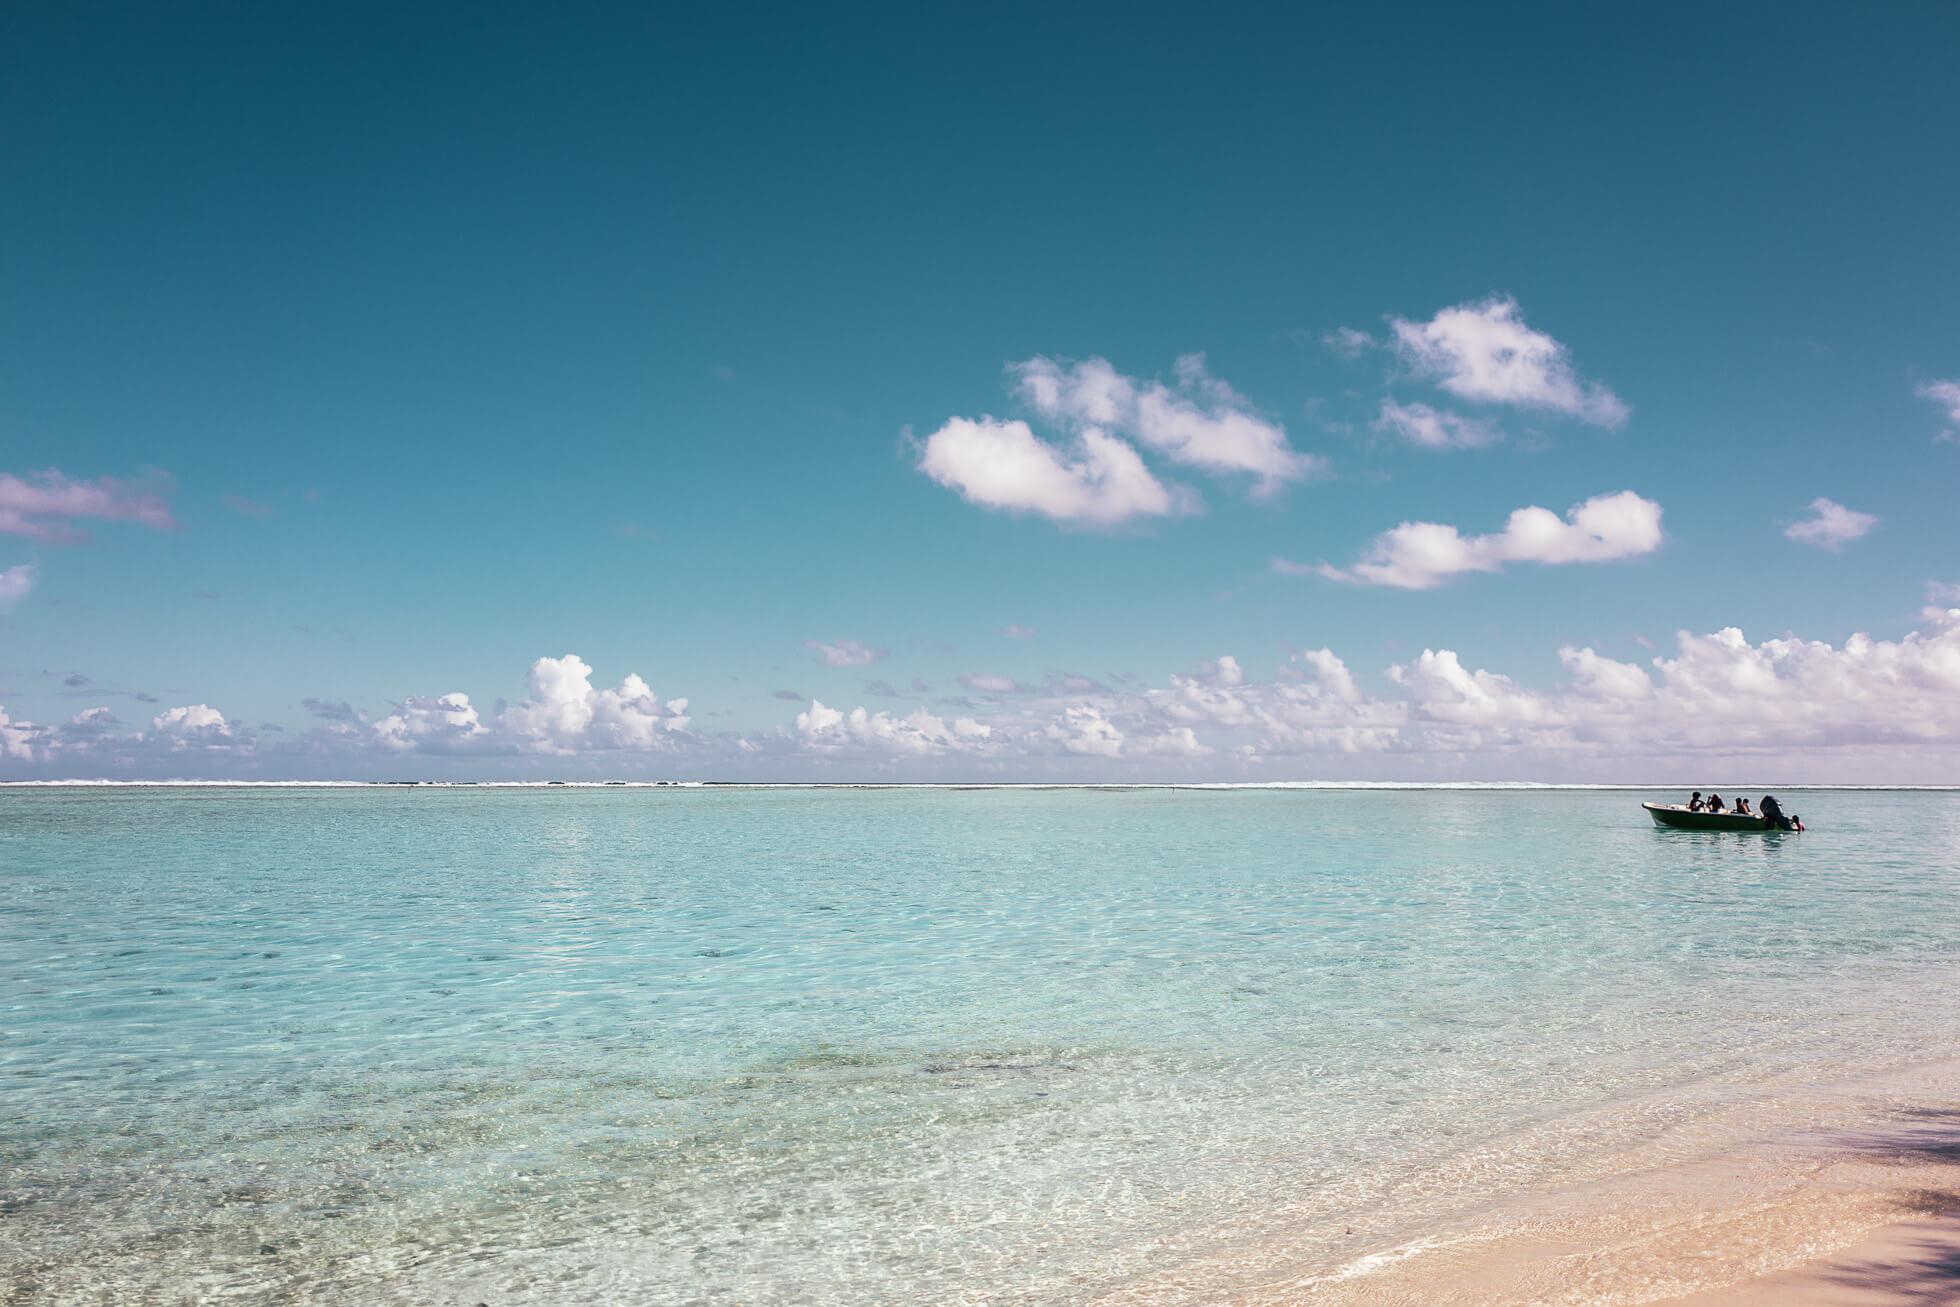 janni-deler-island-hopping-maldivesl1120389